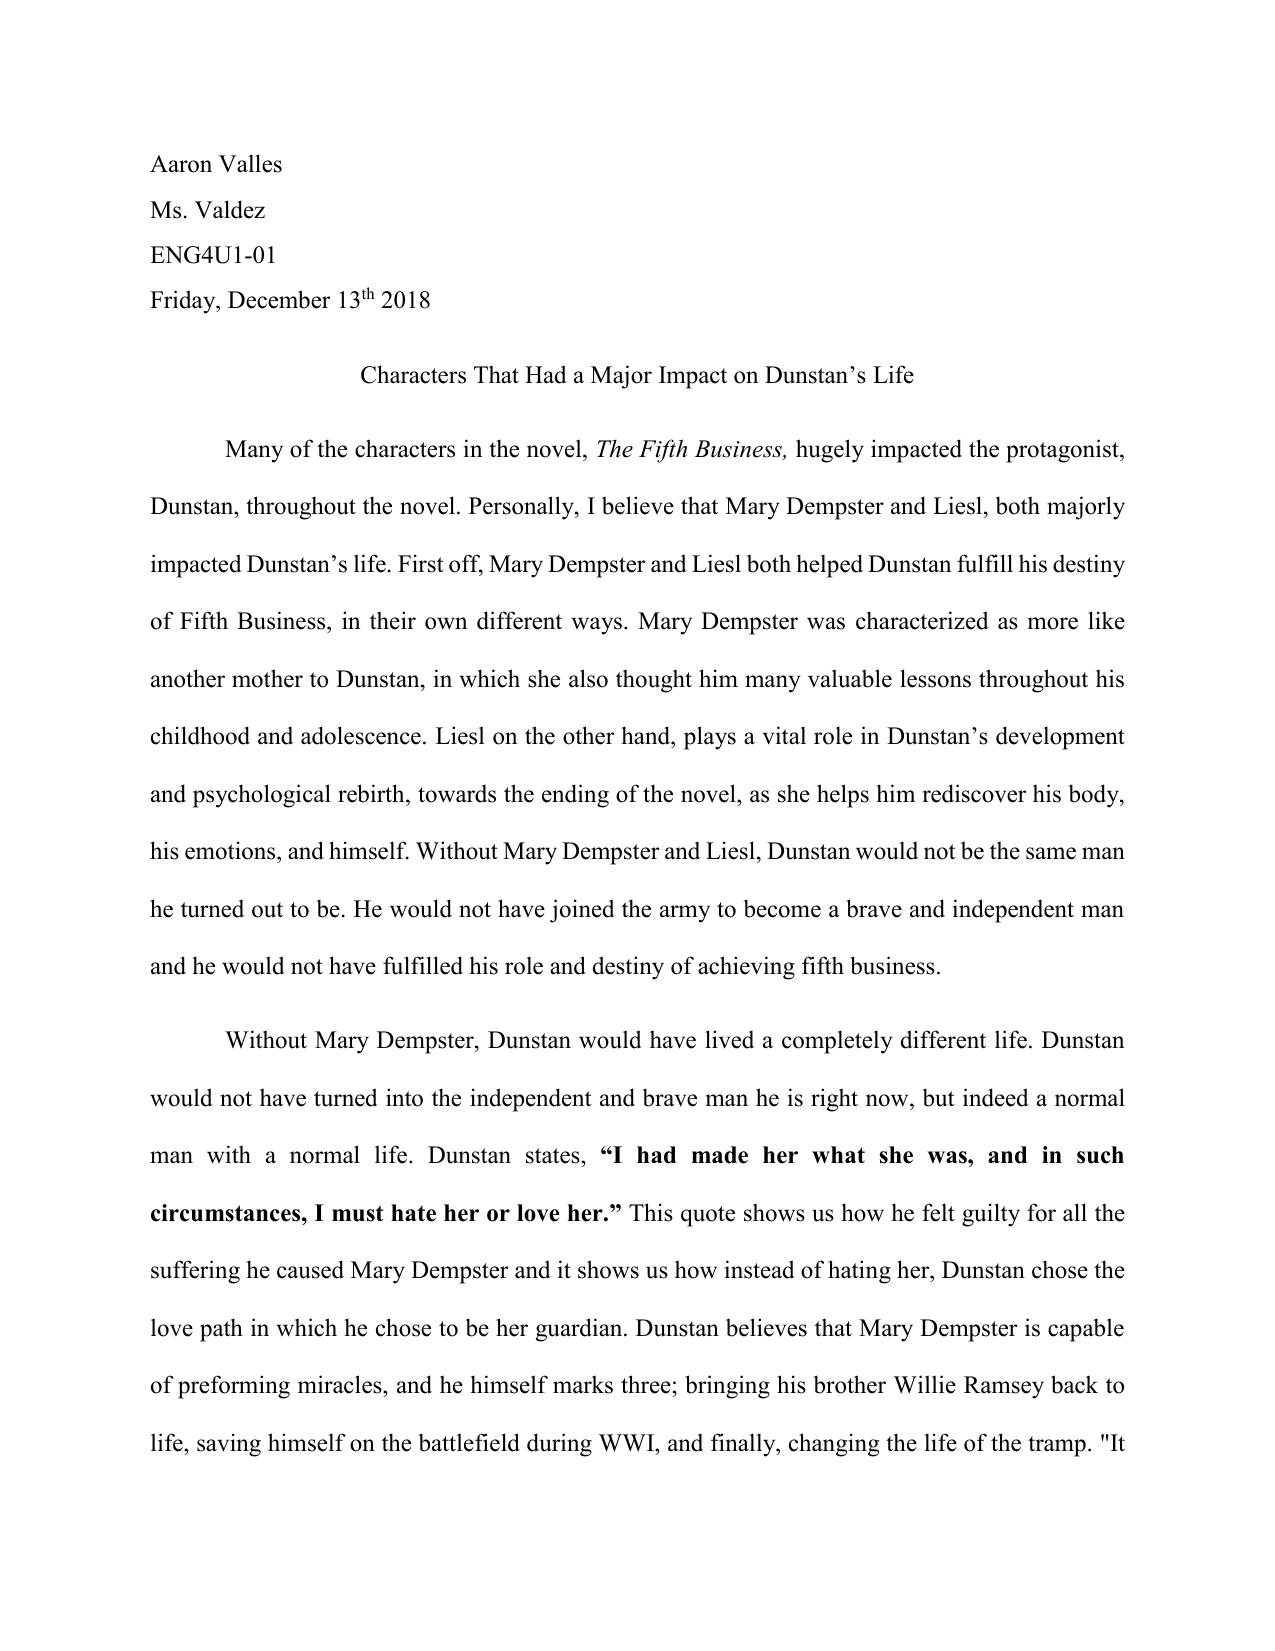 Robert gray meatworks essay